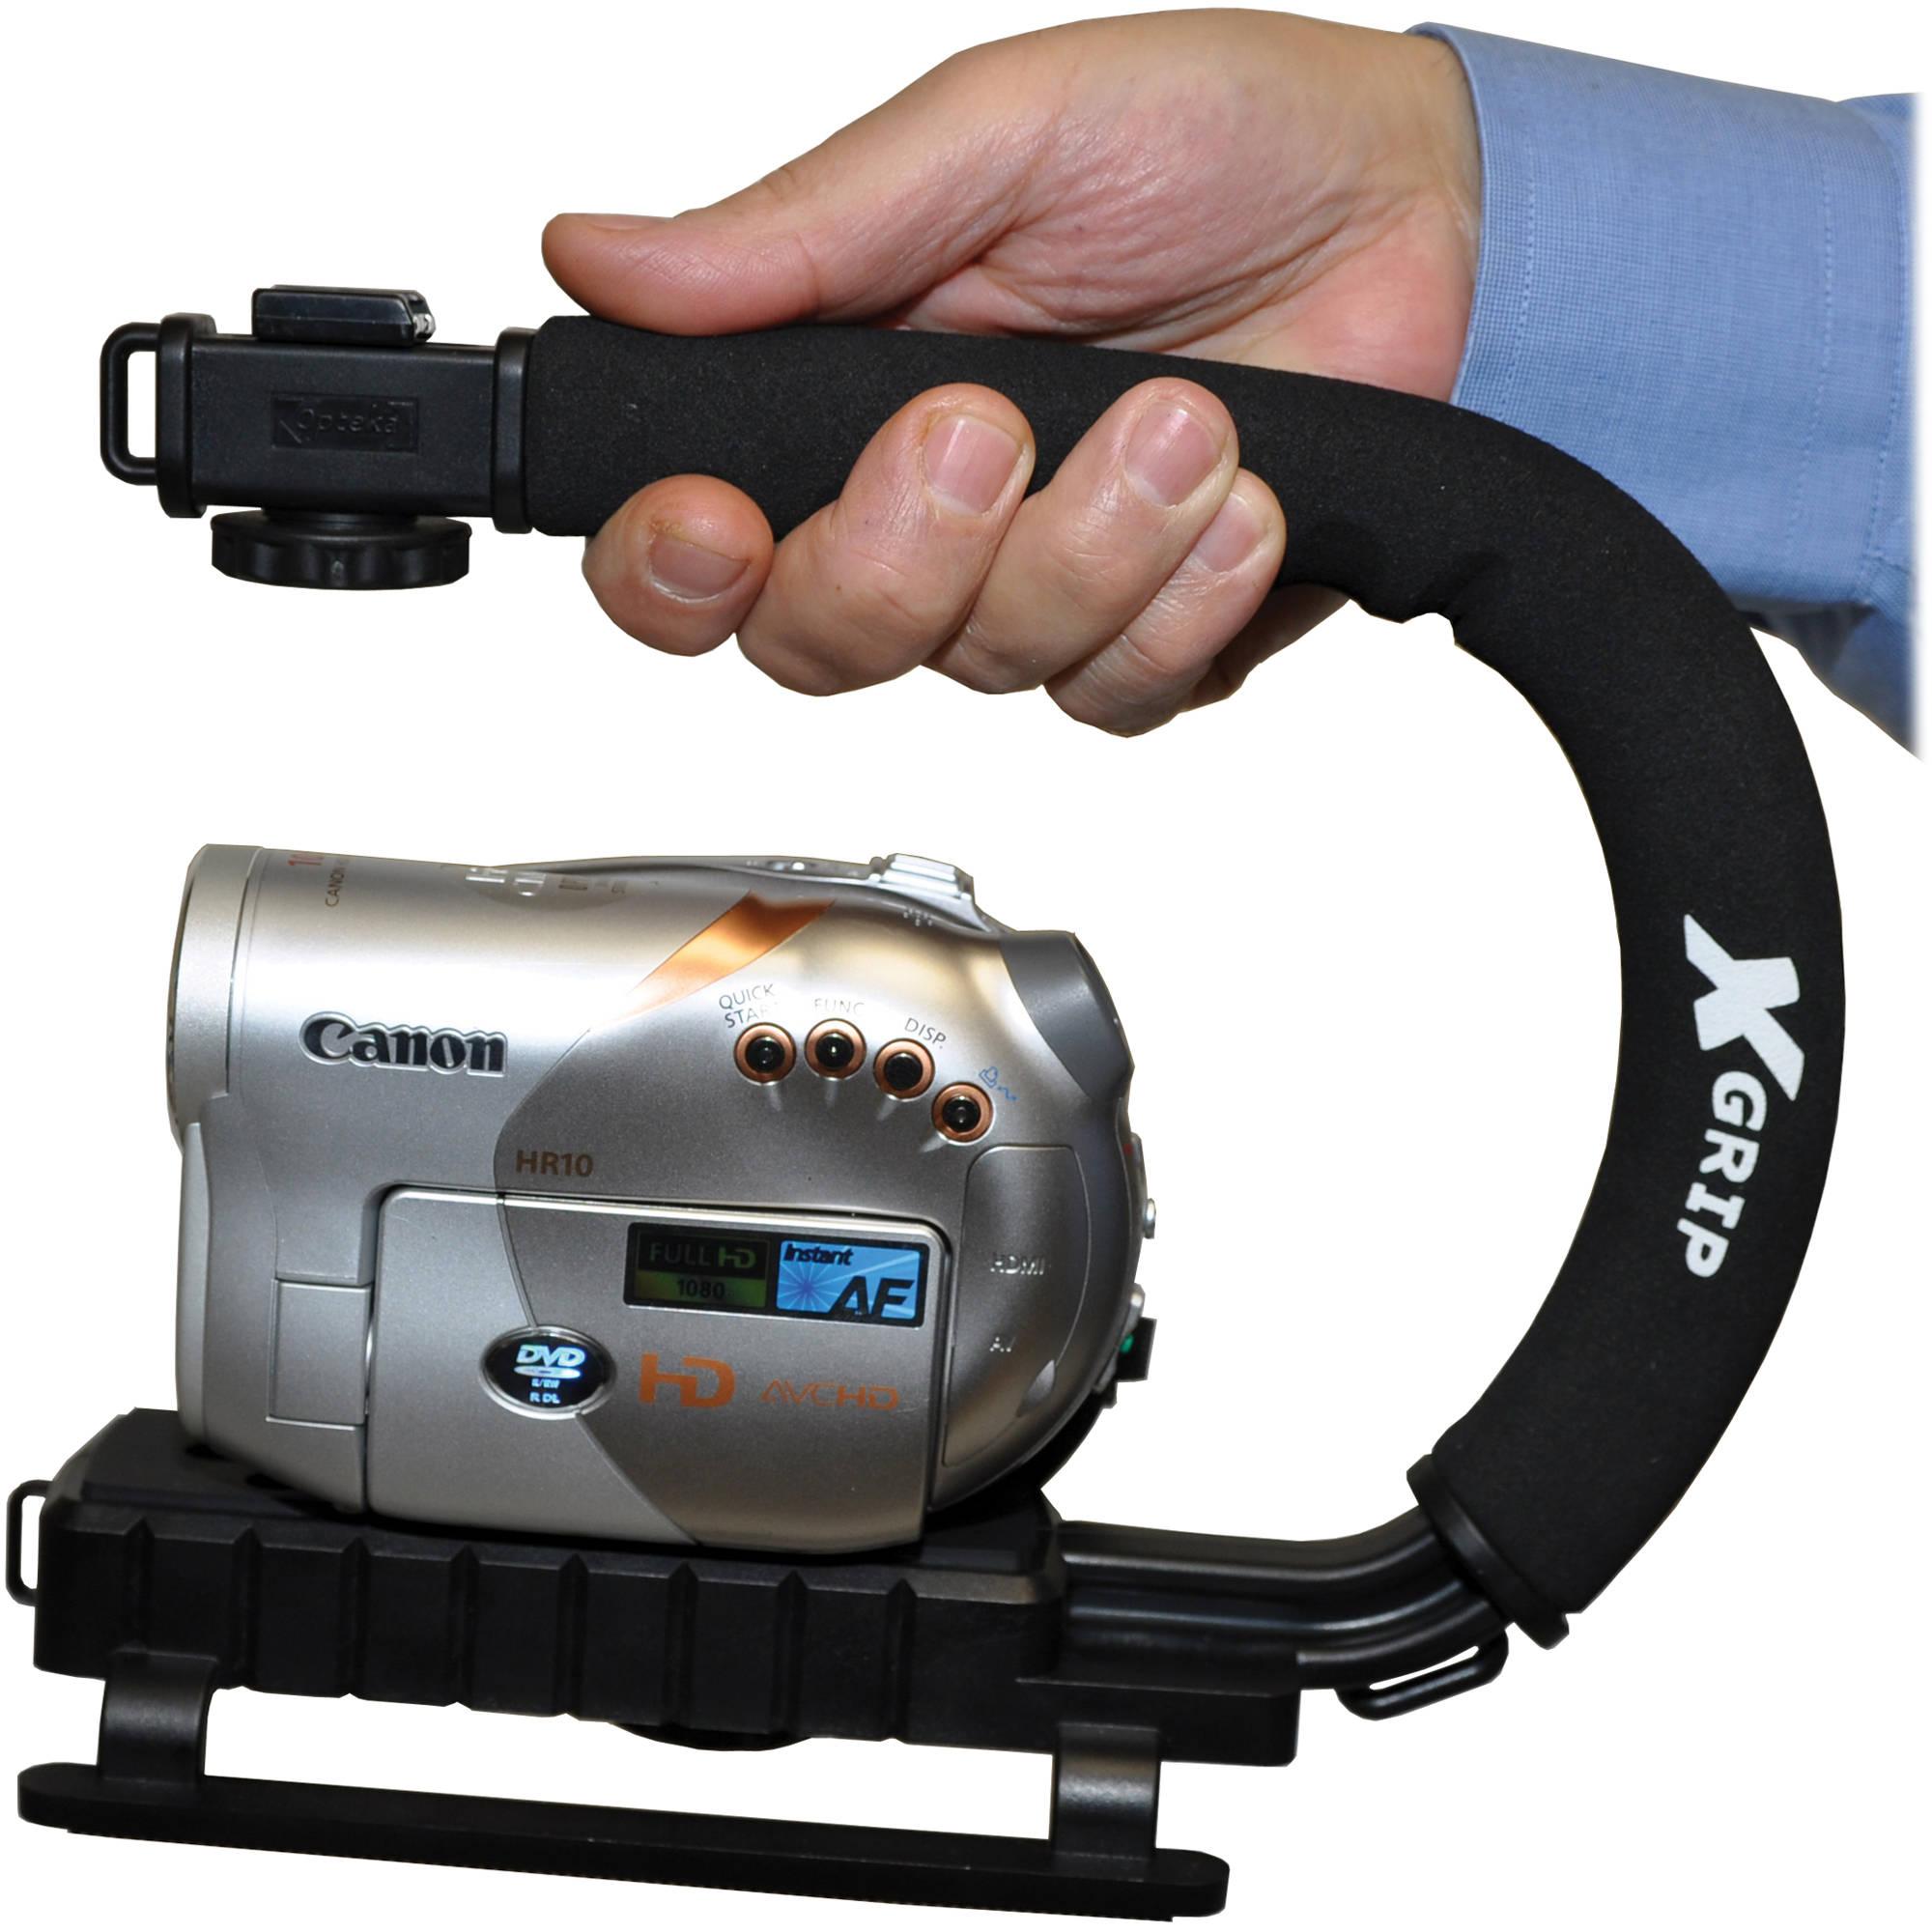 Pro Video Stabilizing Handle Grip for Casio Exilim EX-FH100 Vertical Shoe Mount Stabilizer Handle